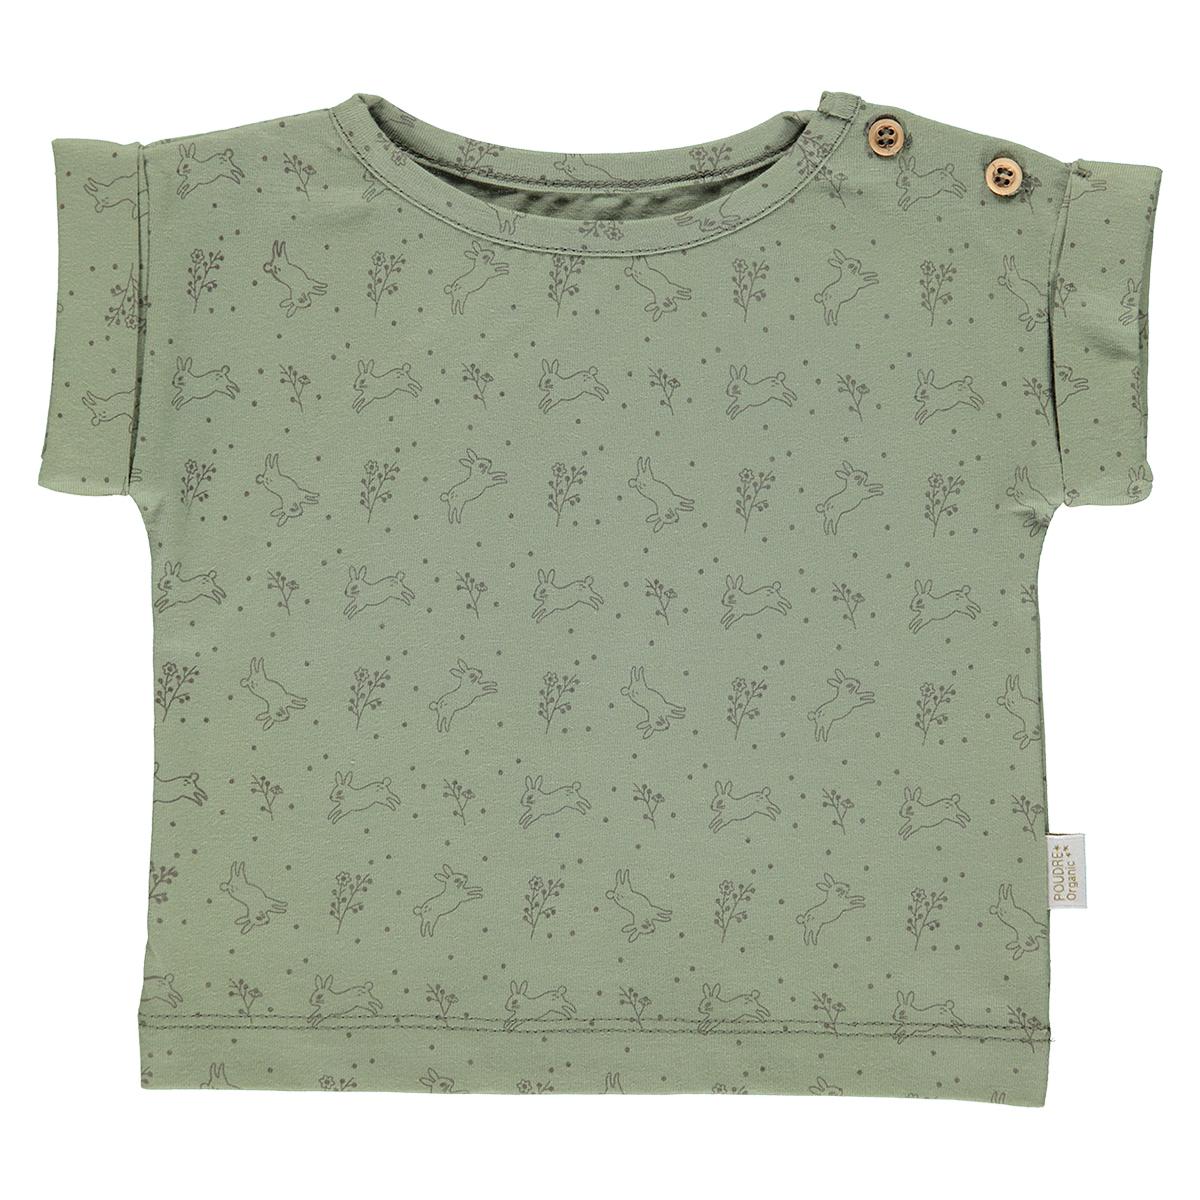 Haut bébé T-Shirt Bourrache Oil Green et Motifs - 12 Mois T-Shirt Bourrache Oil Green et Motifs - 12 Mois